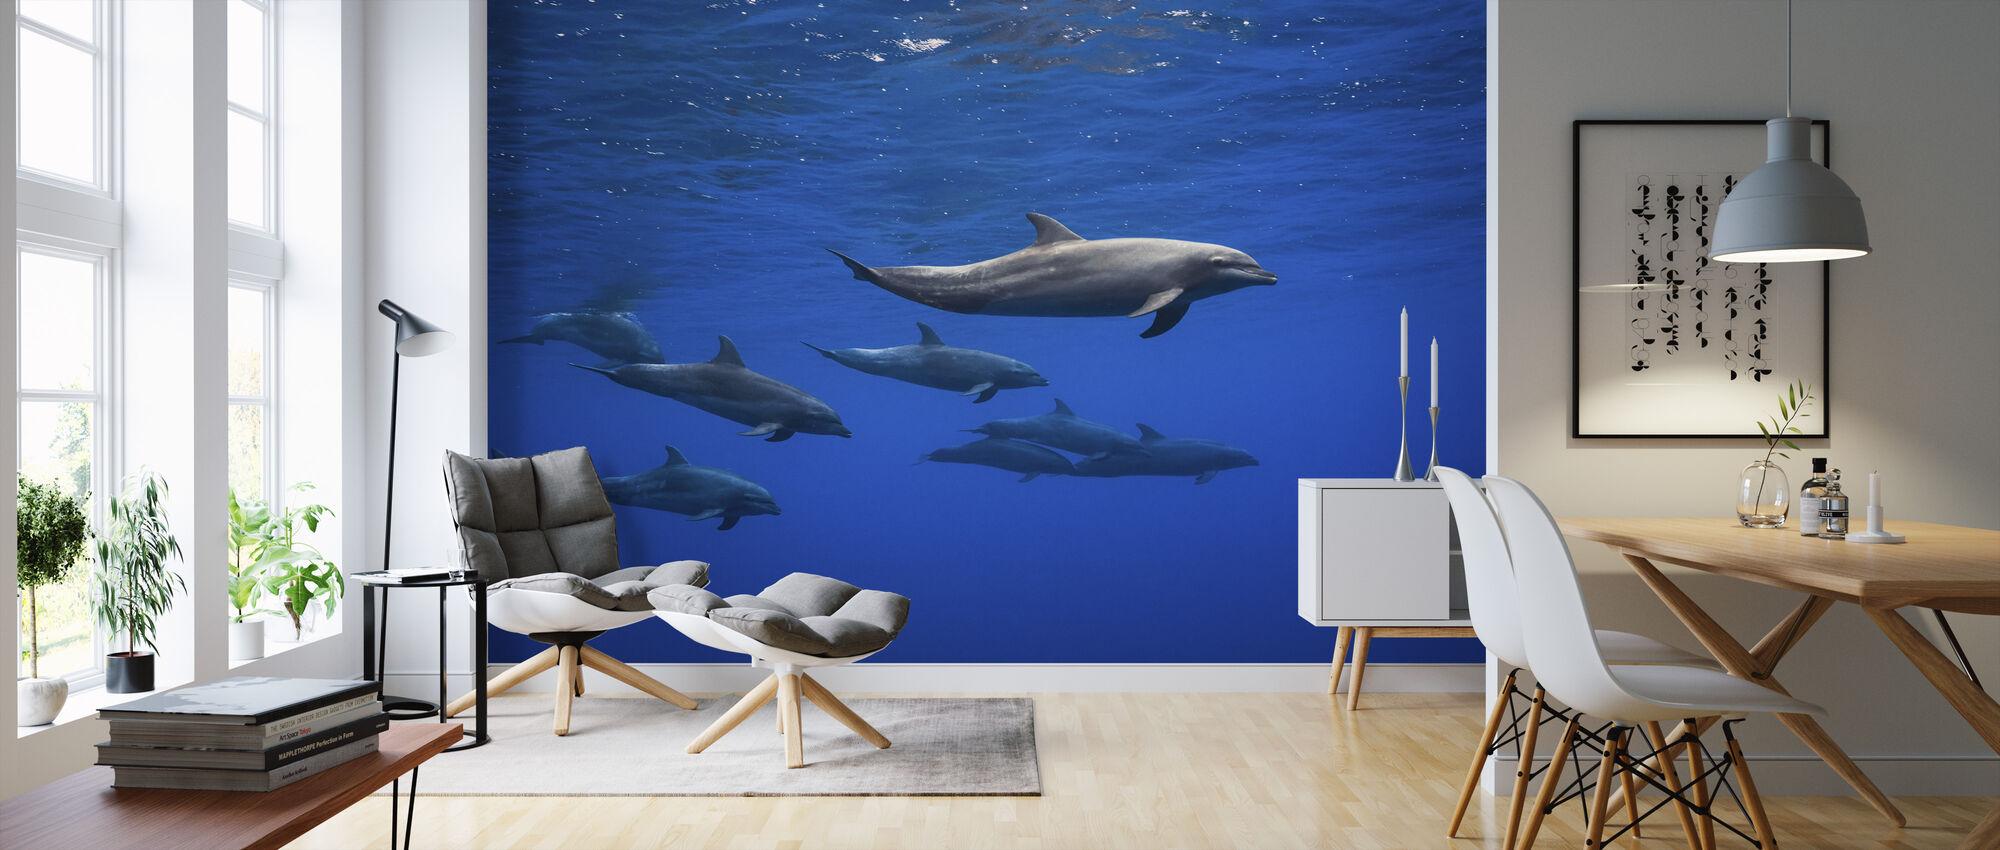 Dolphins - Wallpaper - Living Room